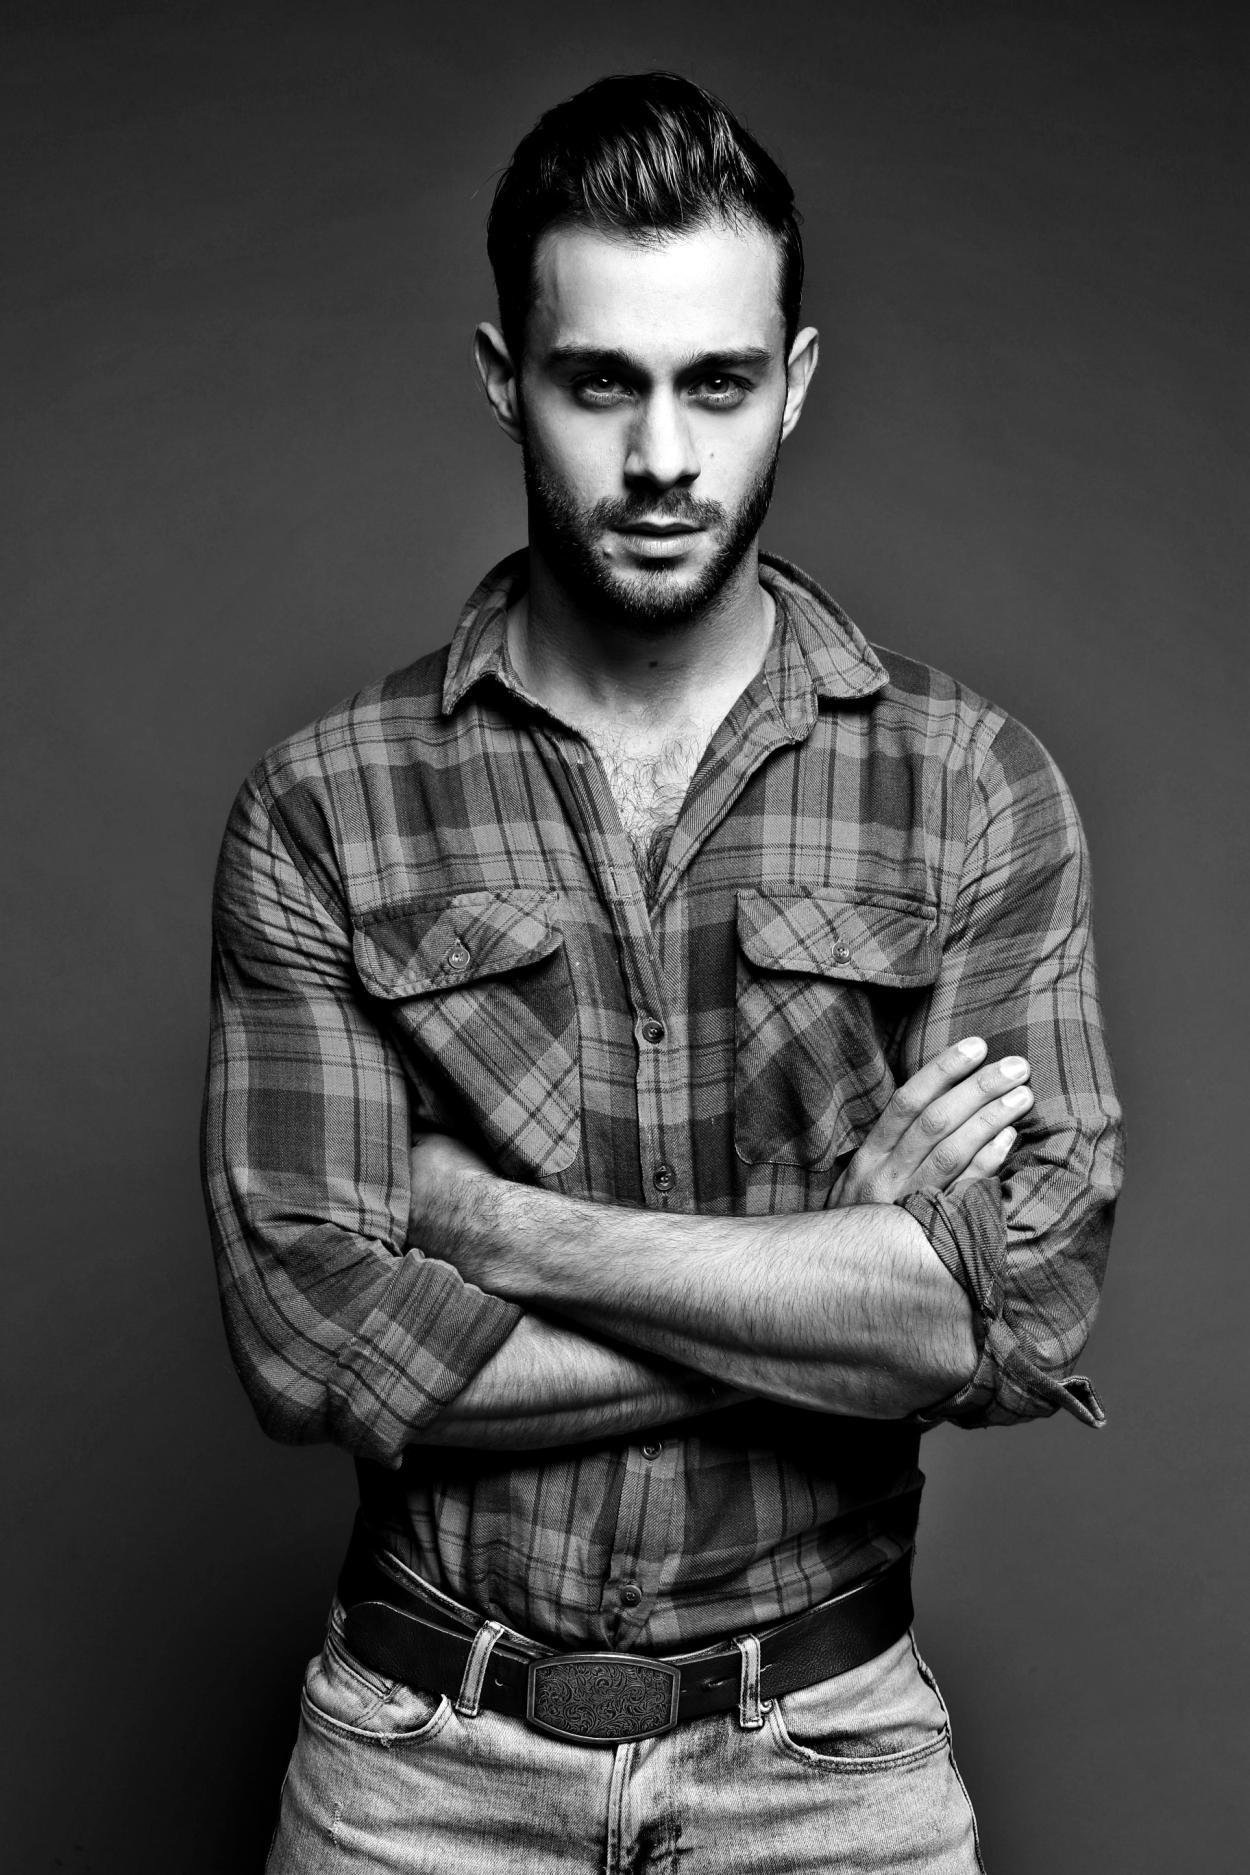 Ravishing male model Adam Phillips at Attitude models posing in splendid new shots captured by Arron Dunworth.